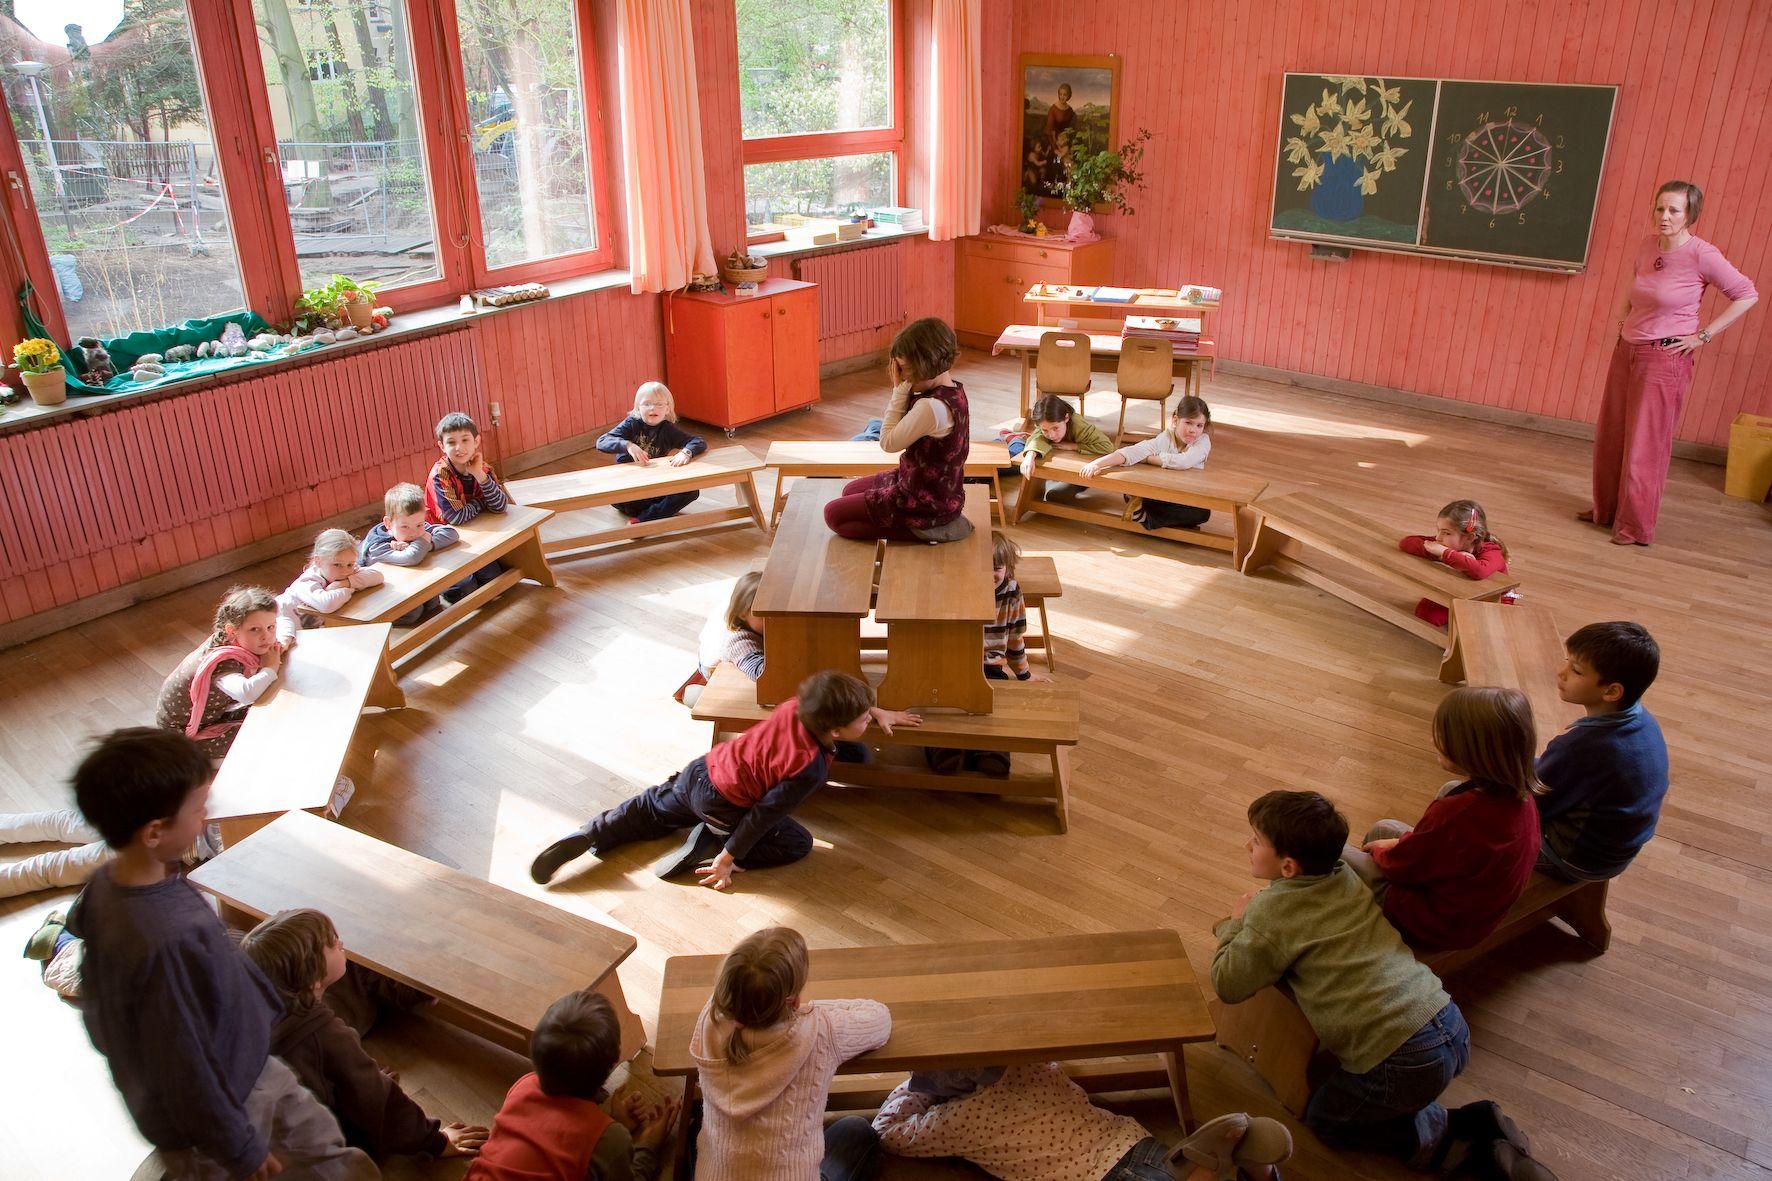 Classroom Rudolf Steiner Schule Berlin: Rudolf Steiner Schule Berlin